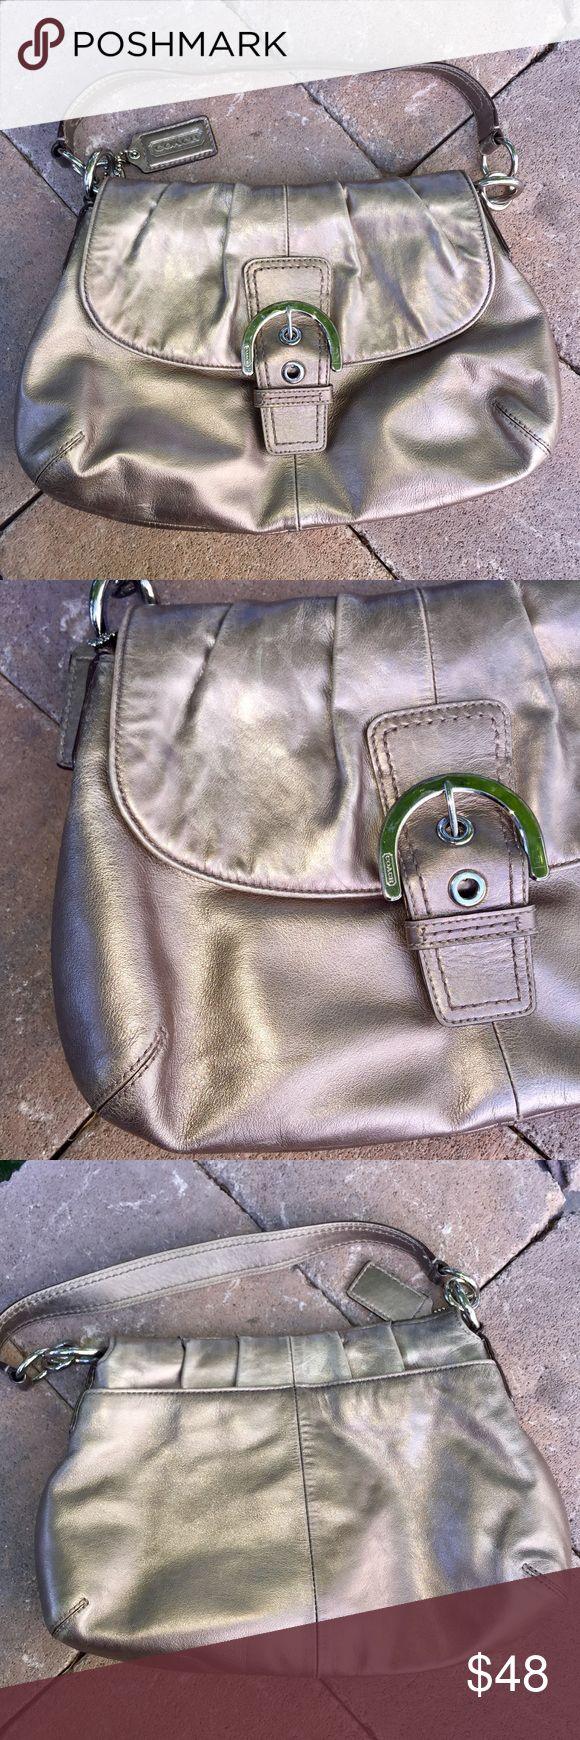 "Coach medium size bronze metallic purse Cute bronze metallic Coach purse. 14"" x 10"" Lots of interior pockets! Very good used condition. Coach Bags Satchels"